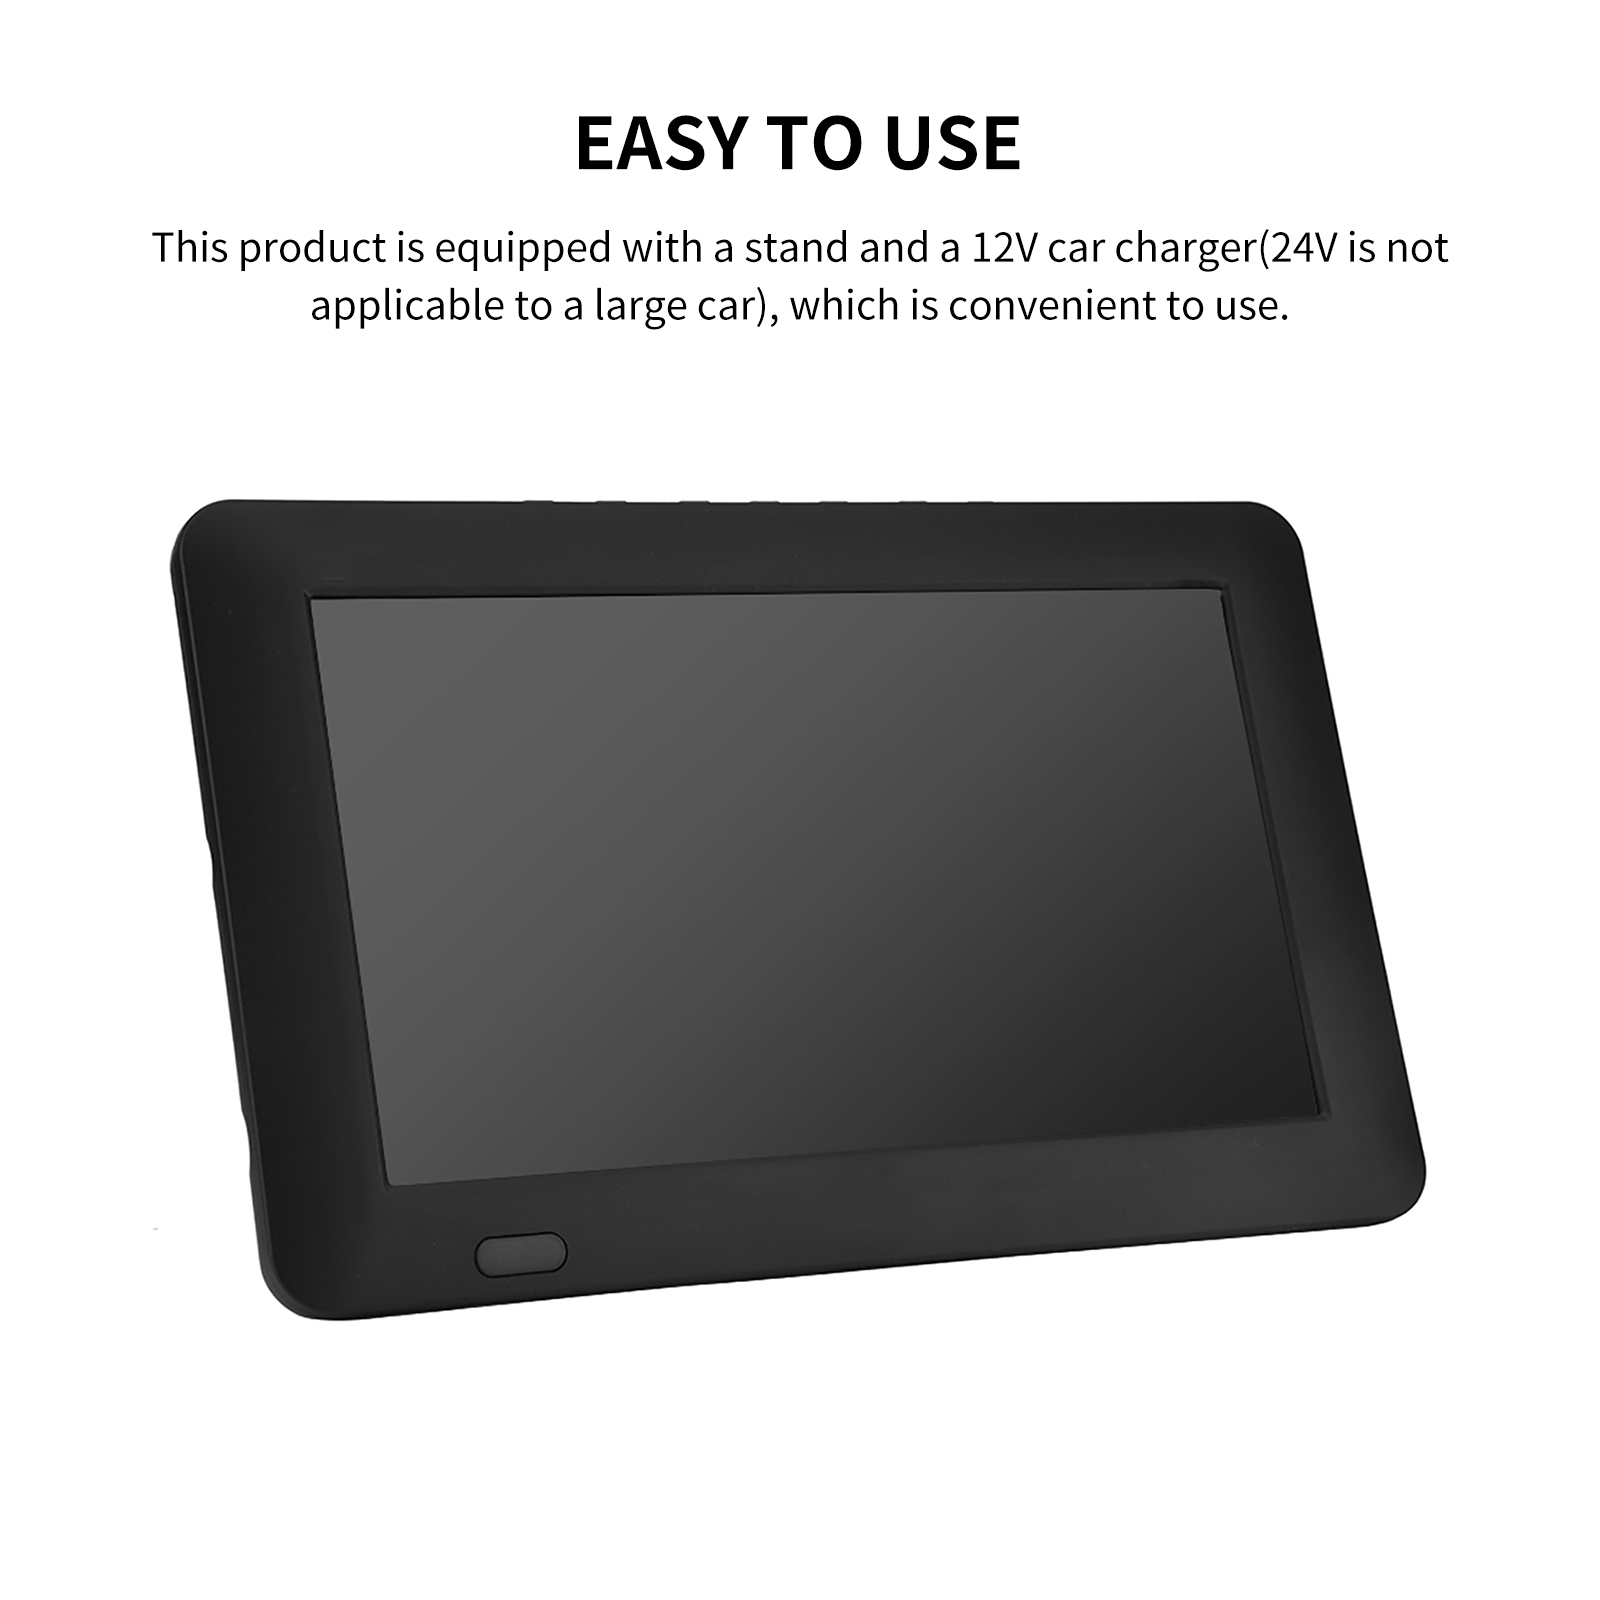 9 Inch HD Portable Digital TV DVB-T2 ATSC ISDB-T TDT Analog Mini Small Car Television Support USB SD Card MP4 AC3 19